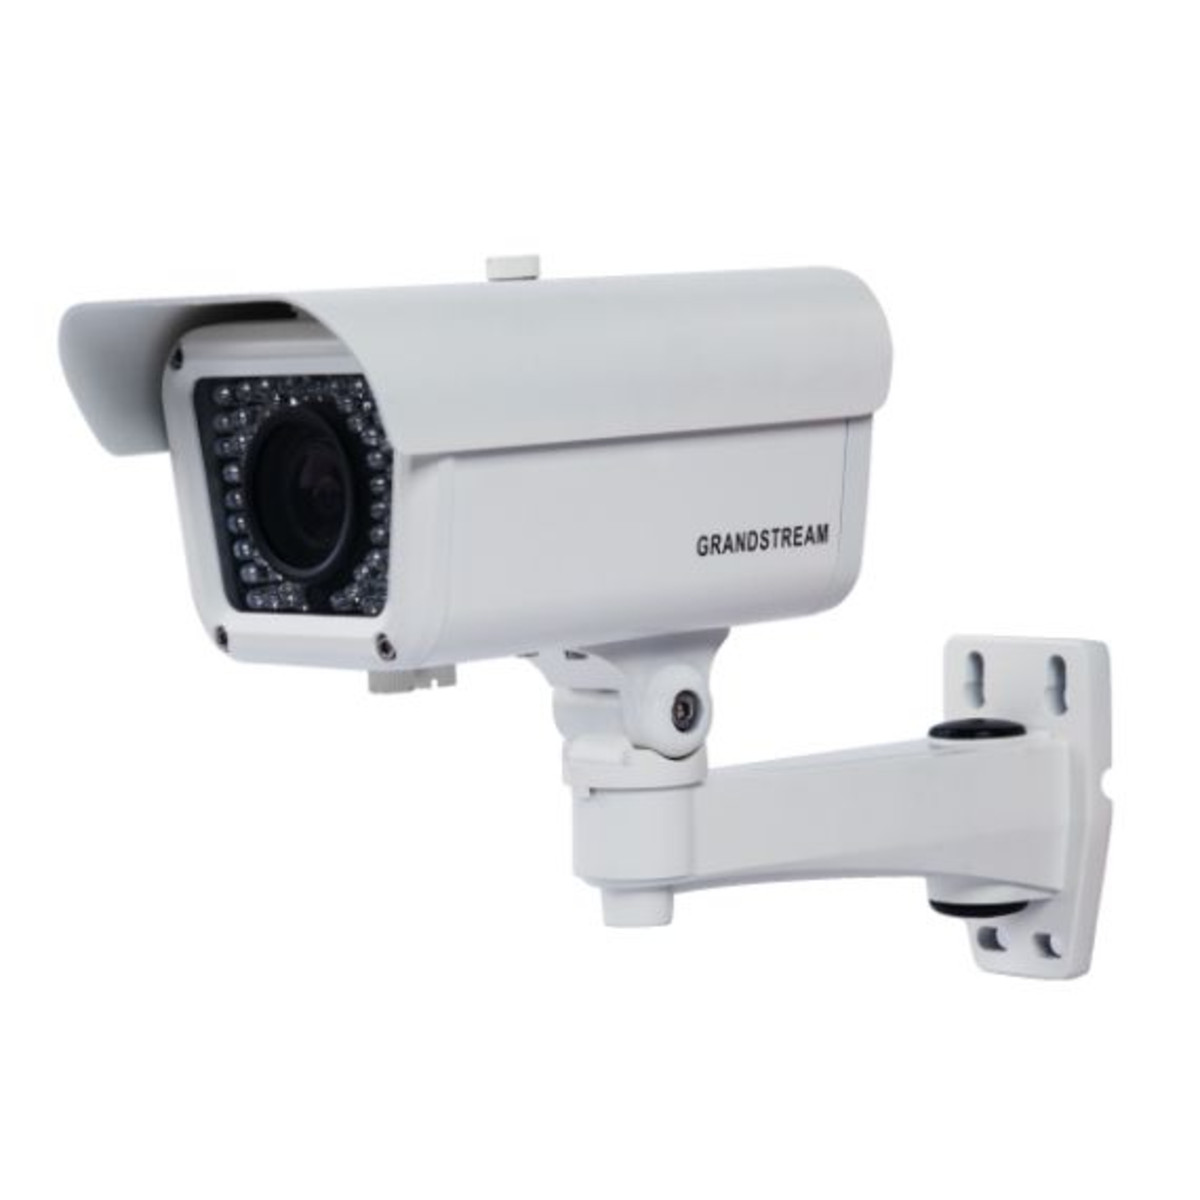 Grandstream-Security-Cameras